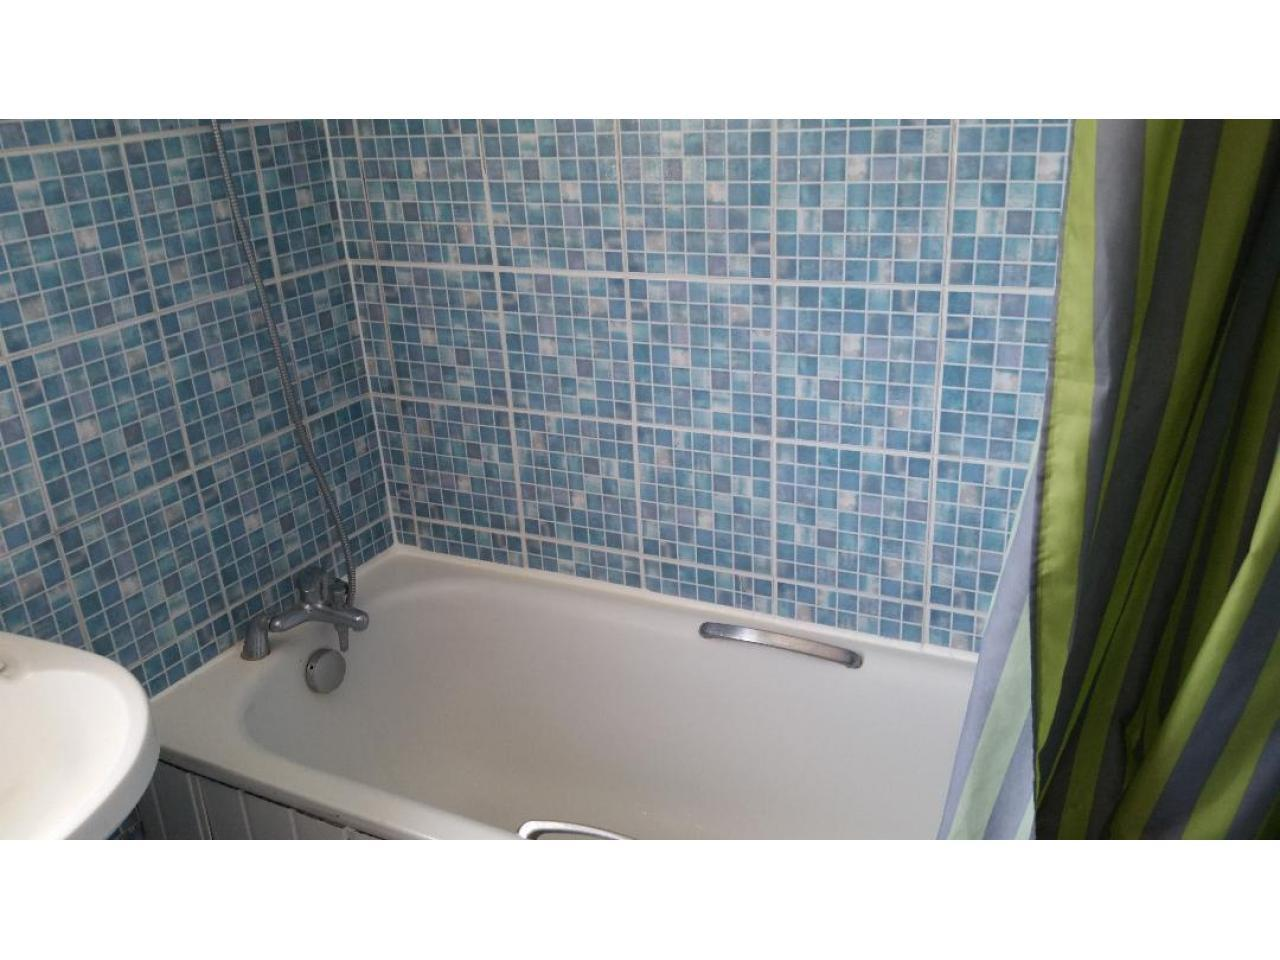 Сдаем  Double Room Hounslow  TW3 4AW £115 в неделю - 2